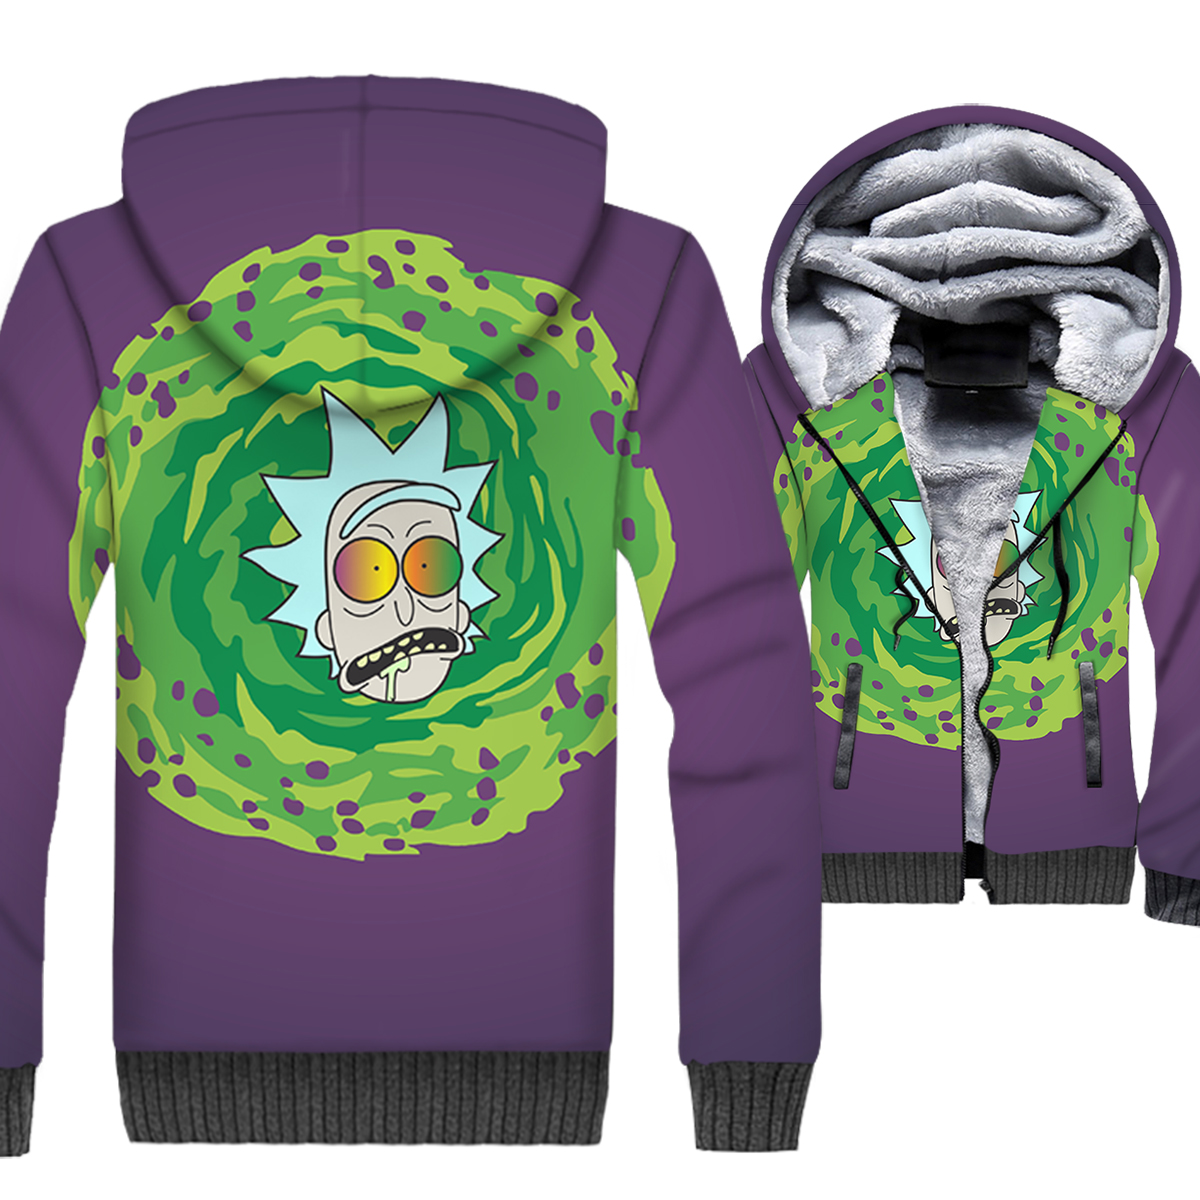 Rick and Morty 3D Print Hoodie Men Funny Sweatshirt Mens Winter Thick Fleece Warm Zip up Coat Science Cool Jacket Brand Clothing